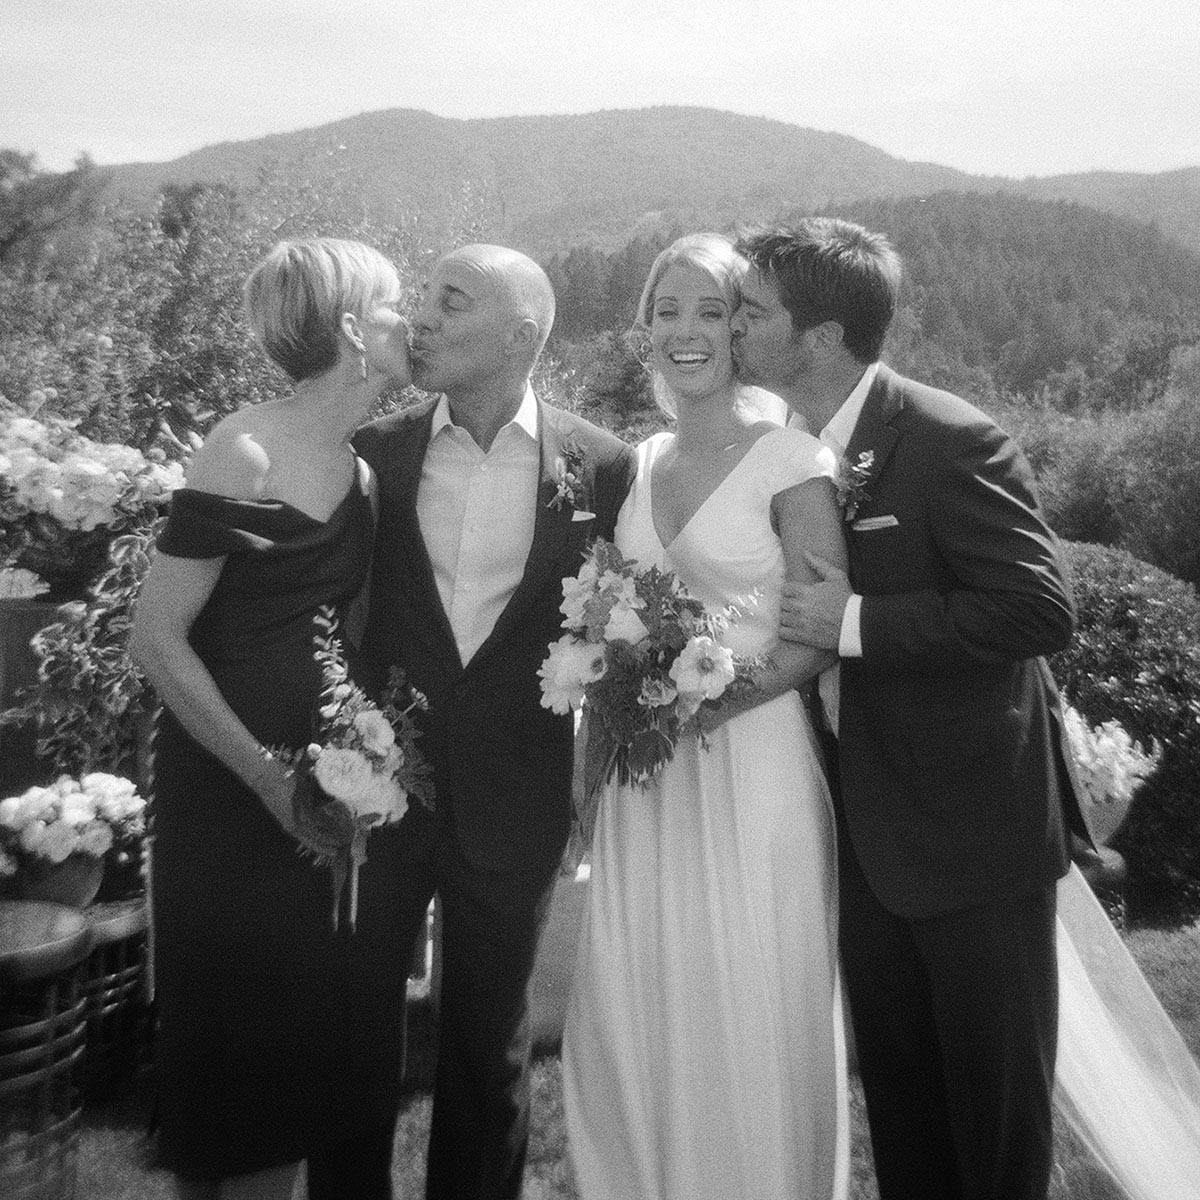 20-family-photo-christina-mcneill-kiss.jpg